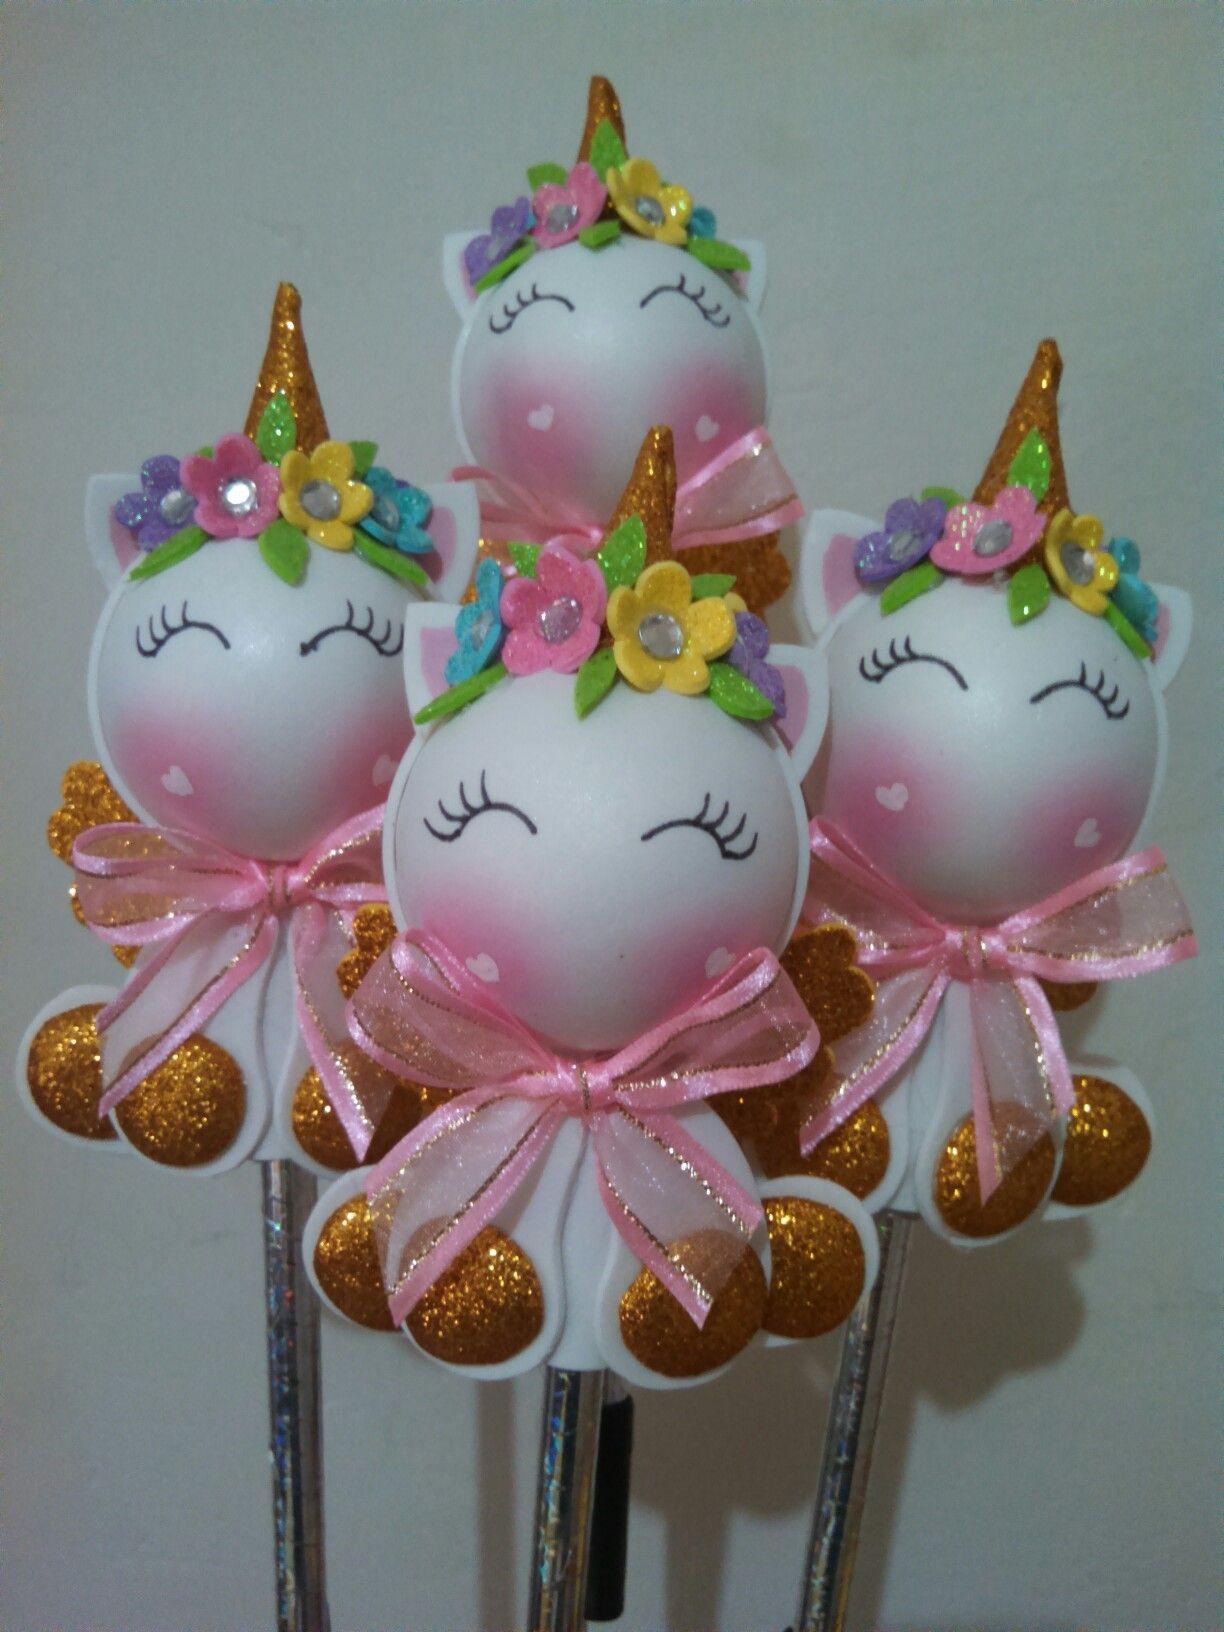 405687b57 Fofupluma unicornio Manualidades Unicornio, Manualidades Para Fiestas,  Manualidades Hermosas, Manualidades Con Goma Eva